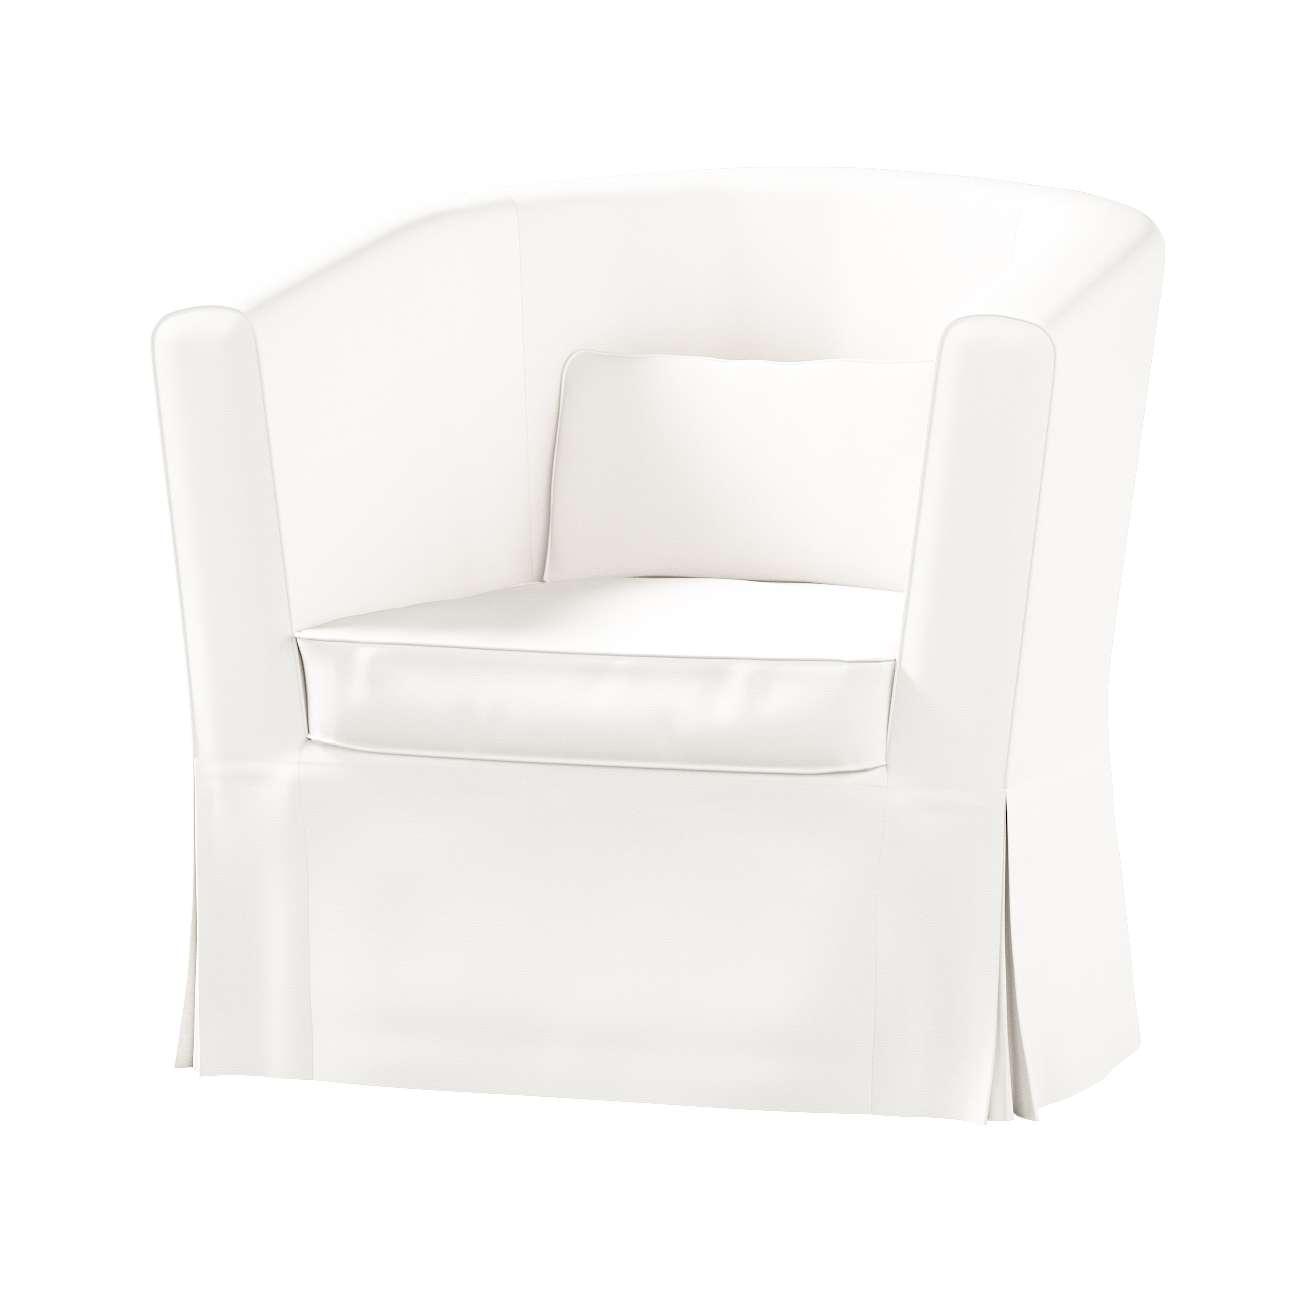 Pokrowiec na fotel Ektorp Tullsta fotel Ektorp Tullsta w kolekcji Cotton Panama, tkanina: 702-34